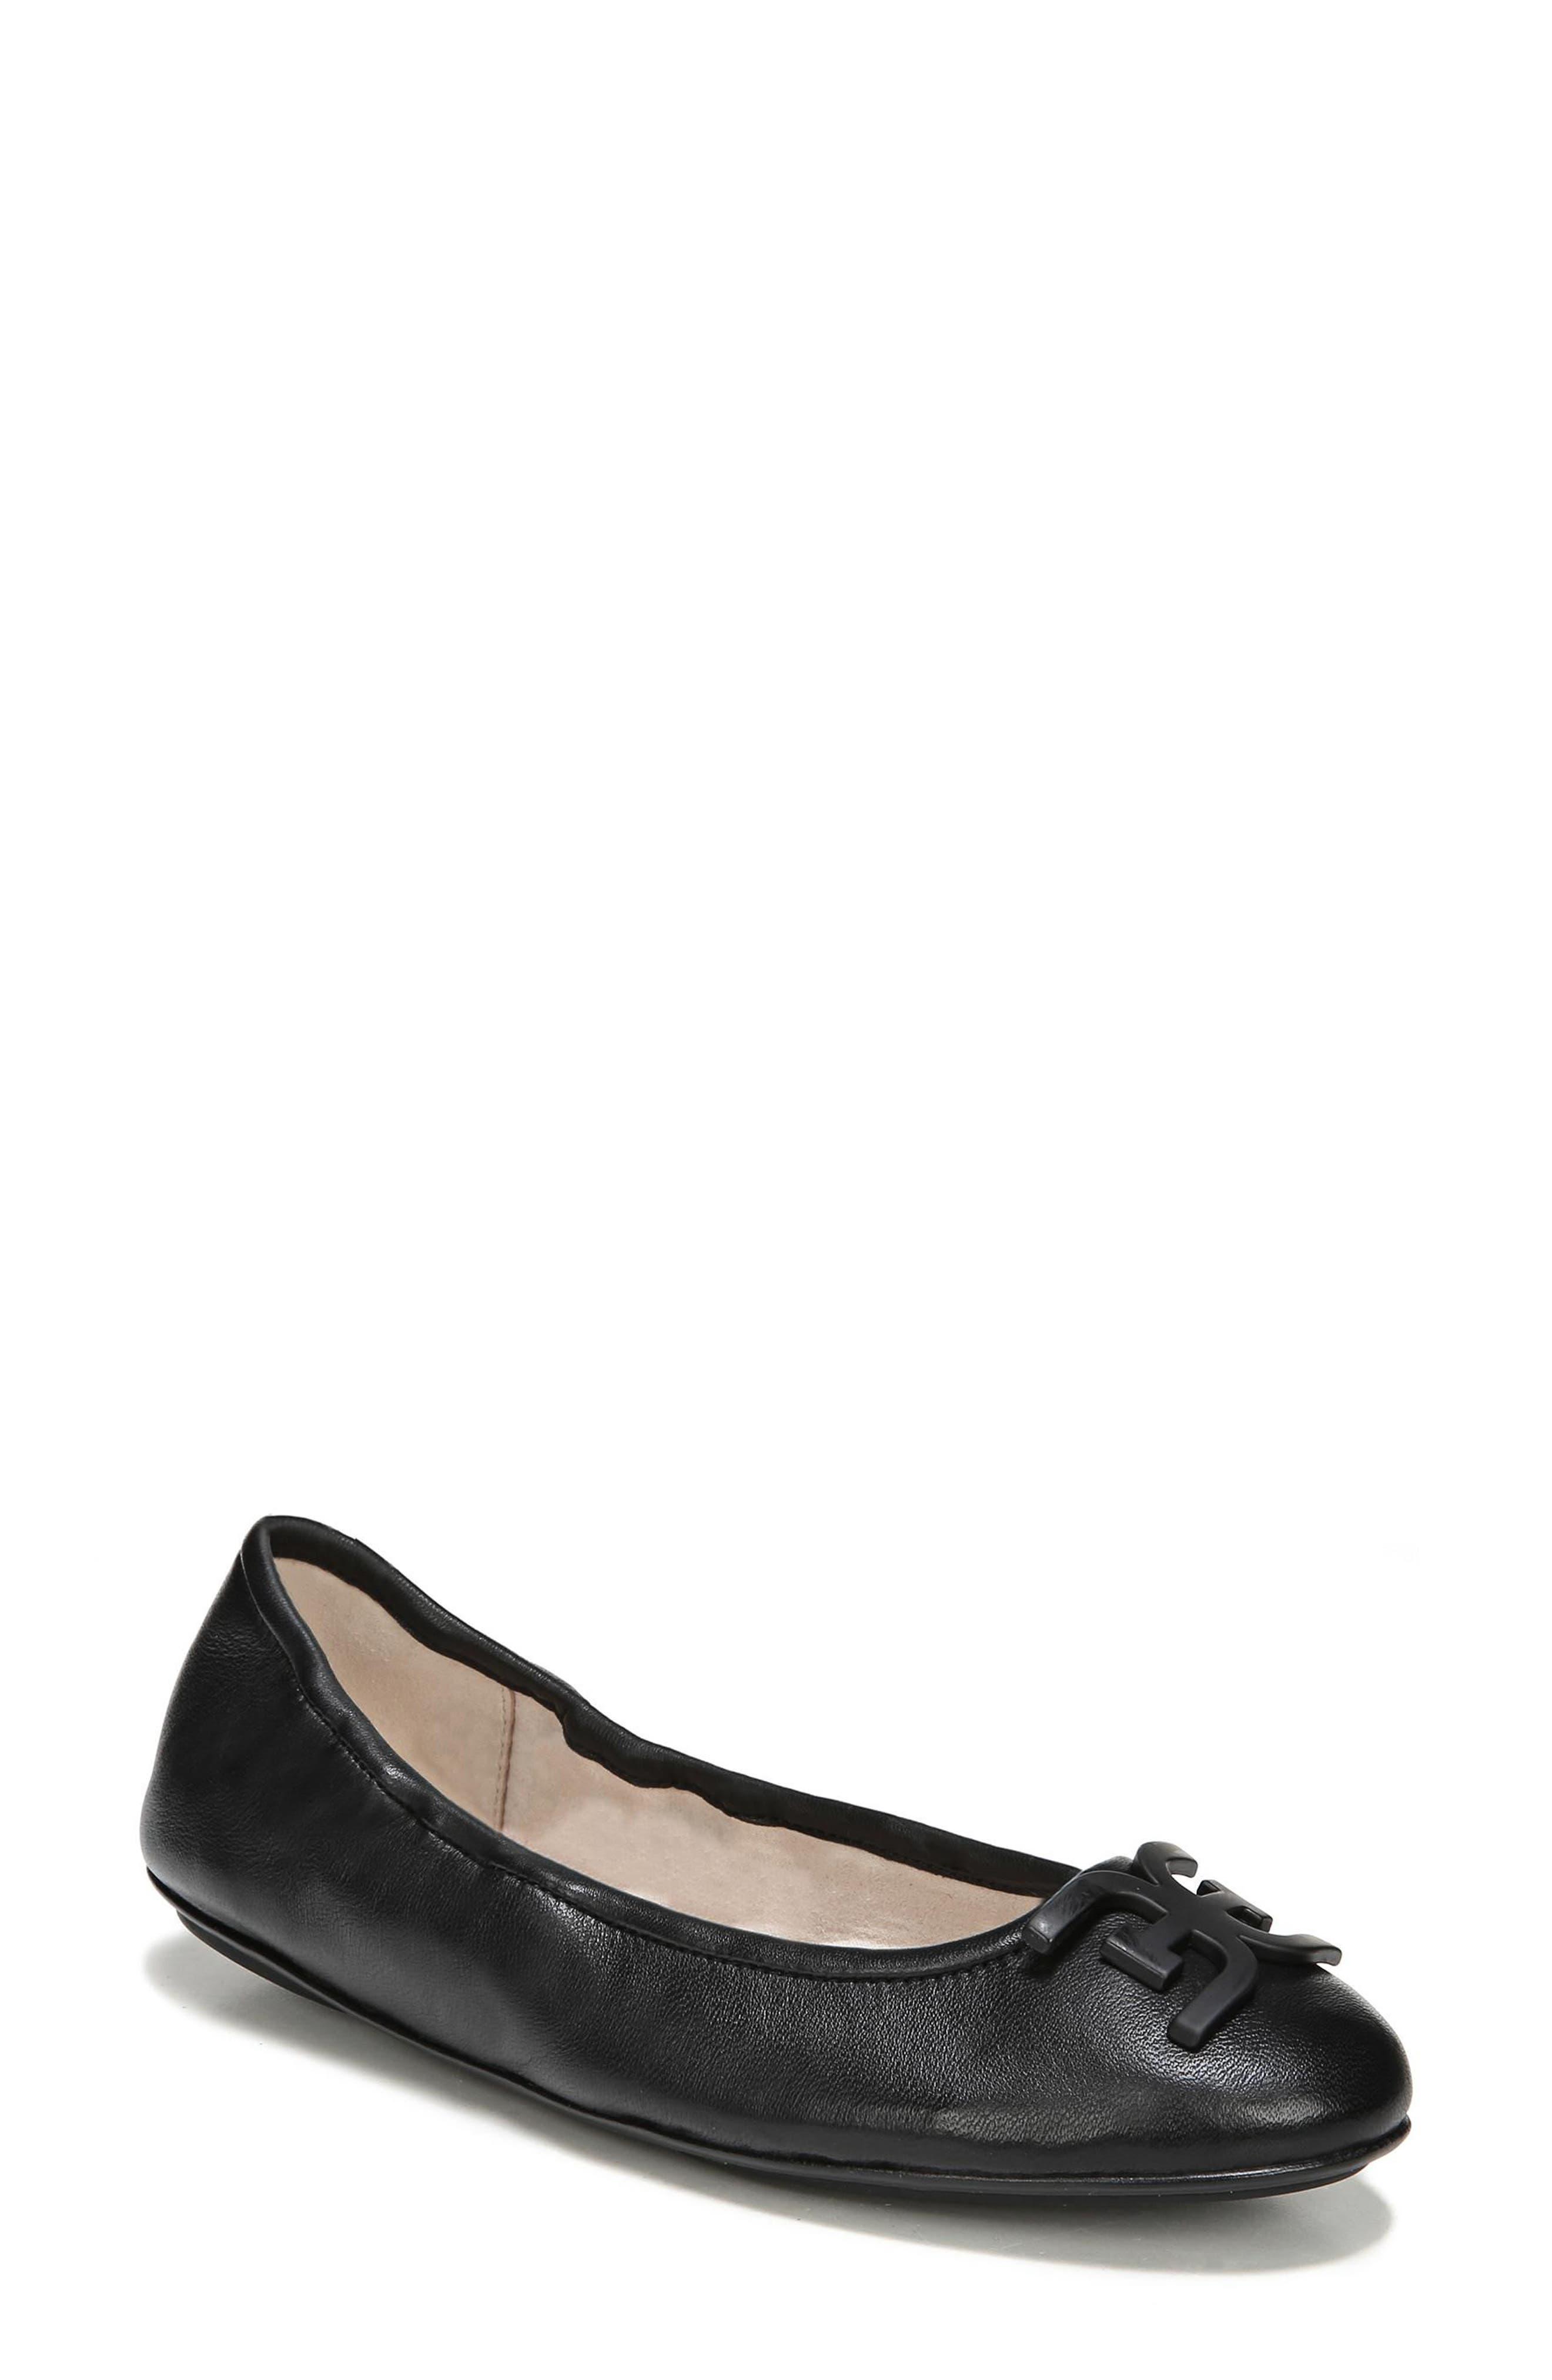 Florence Ballet Flat,                             Main thumbnail 1, color,                             Black Leather